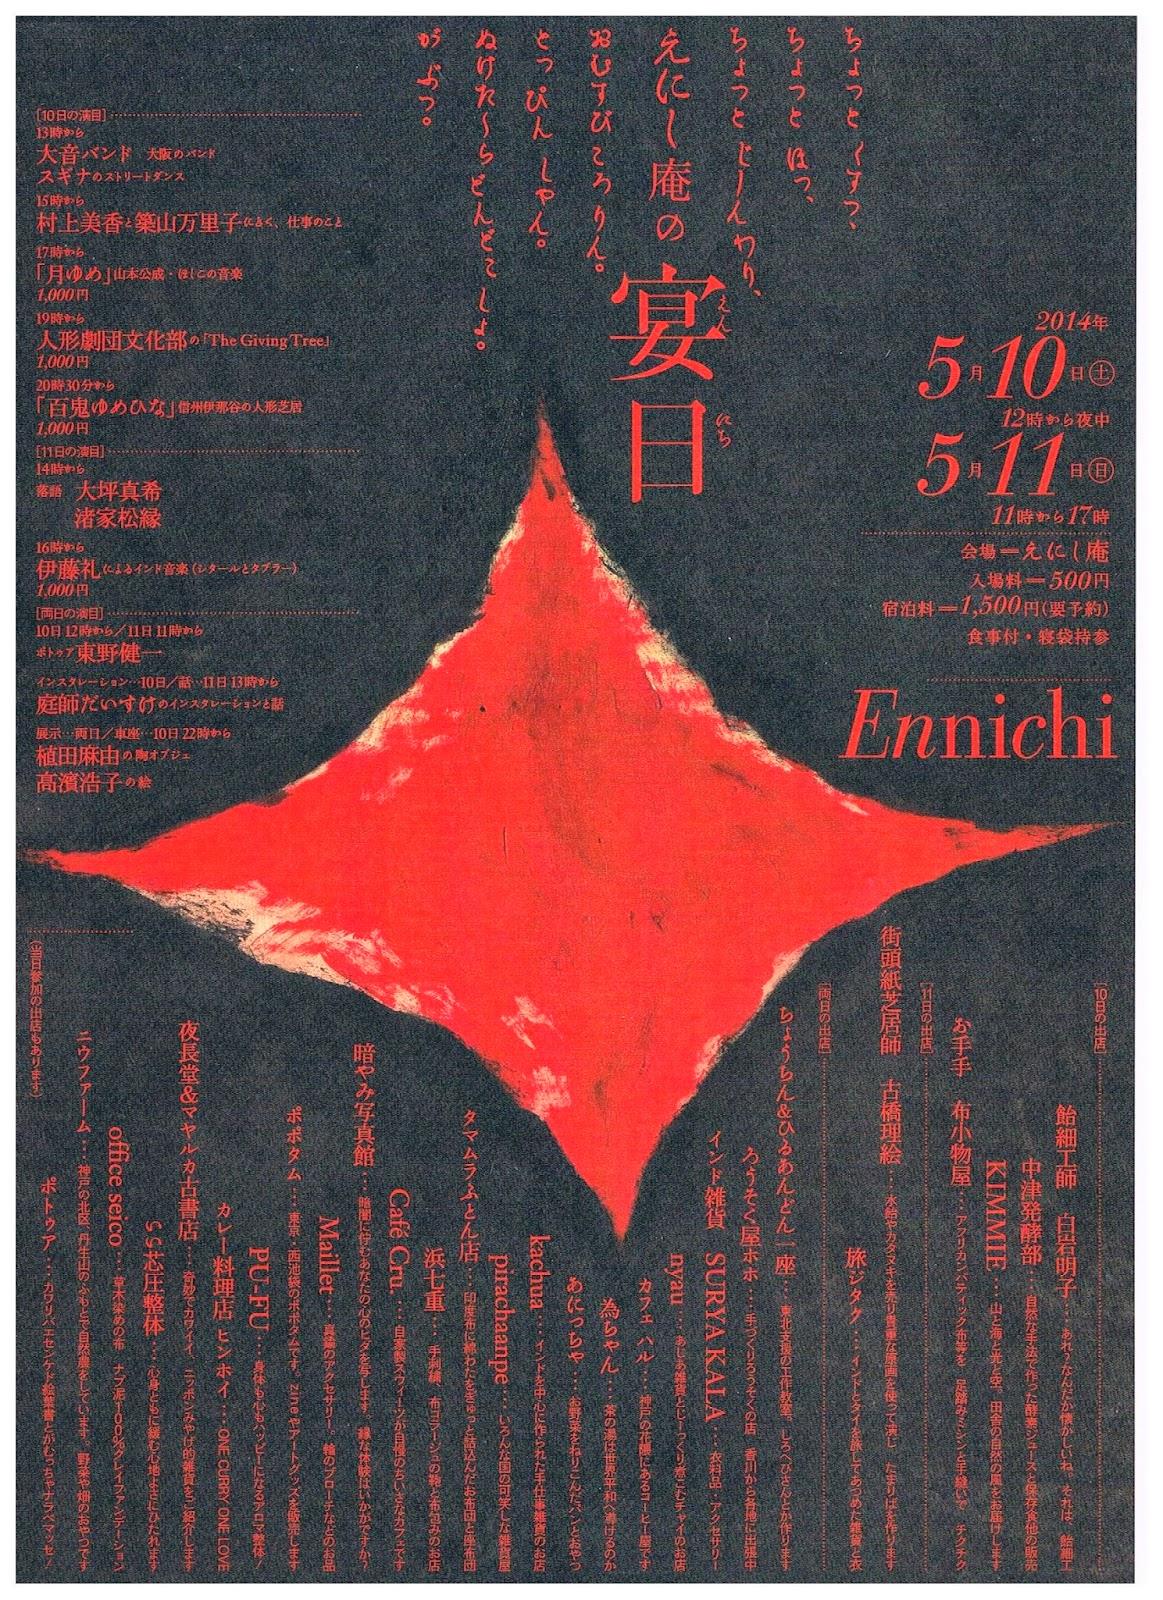 http://yumehina-top.blogspot.jp/2014/05/2014-510.html